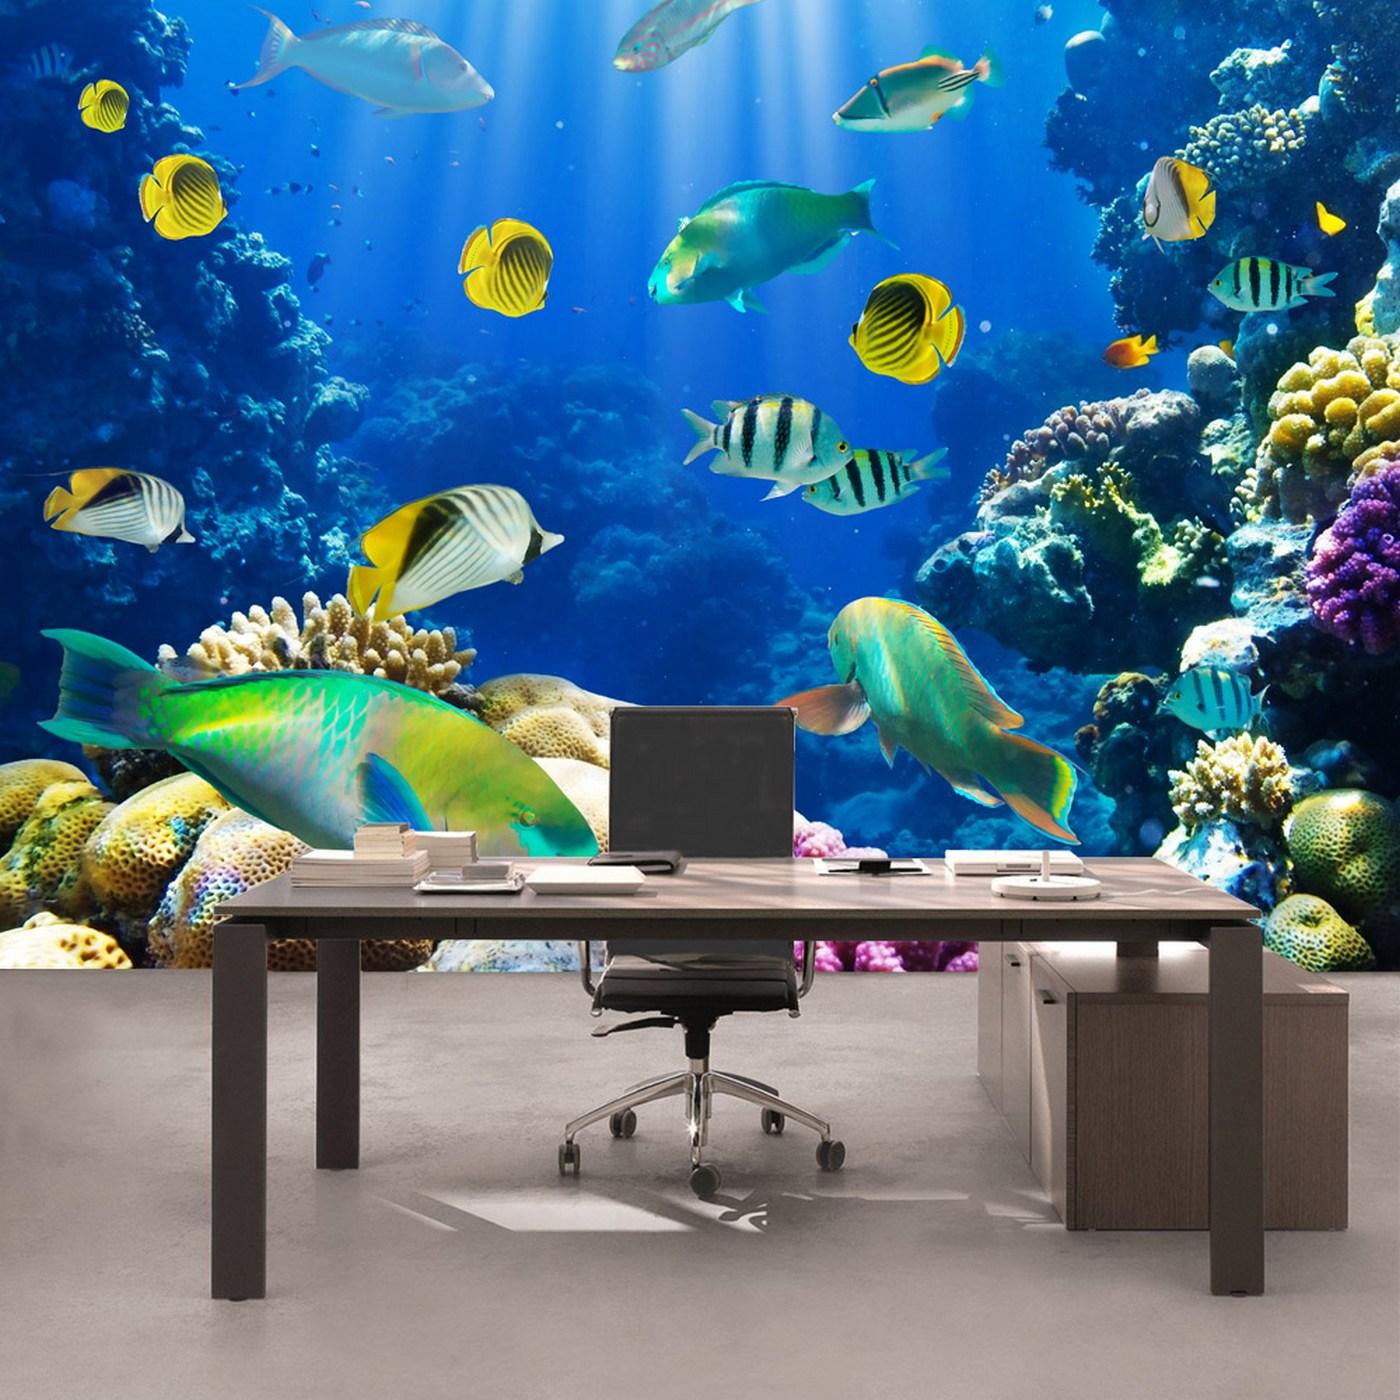 FTVL 0033 400X280 SCENE 8 1000X1000X96 RGB - Tapete Aquarium